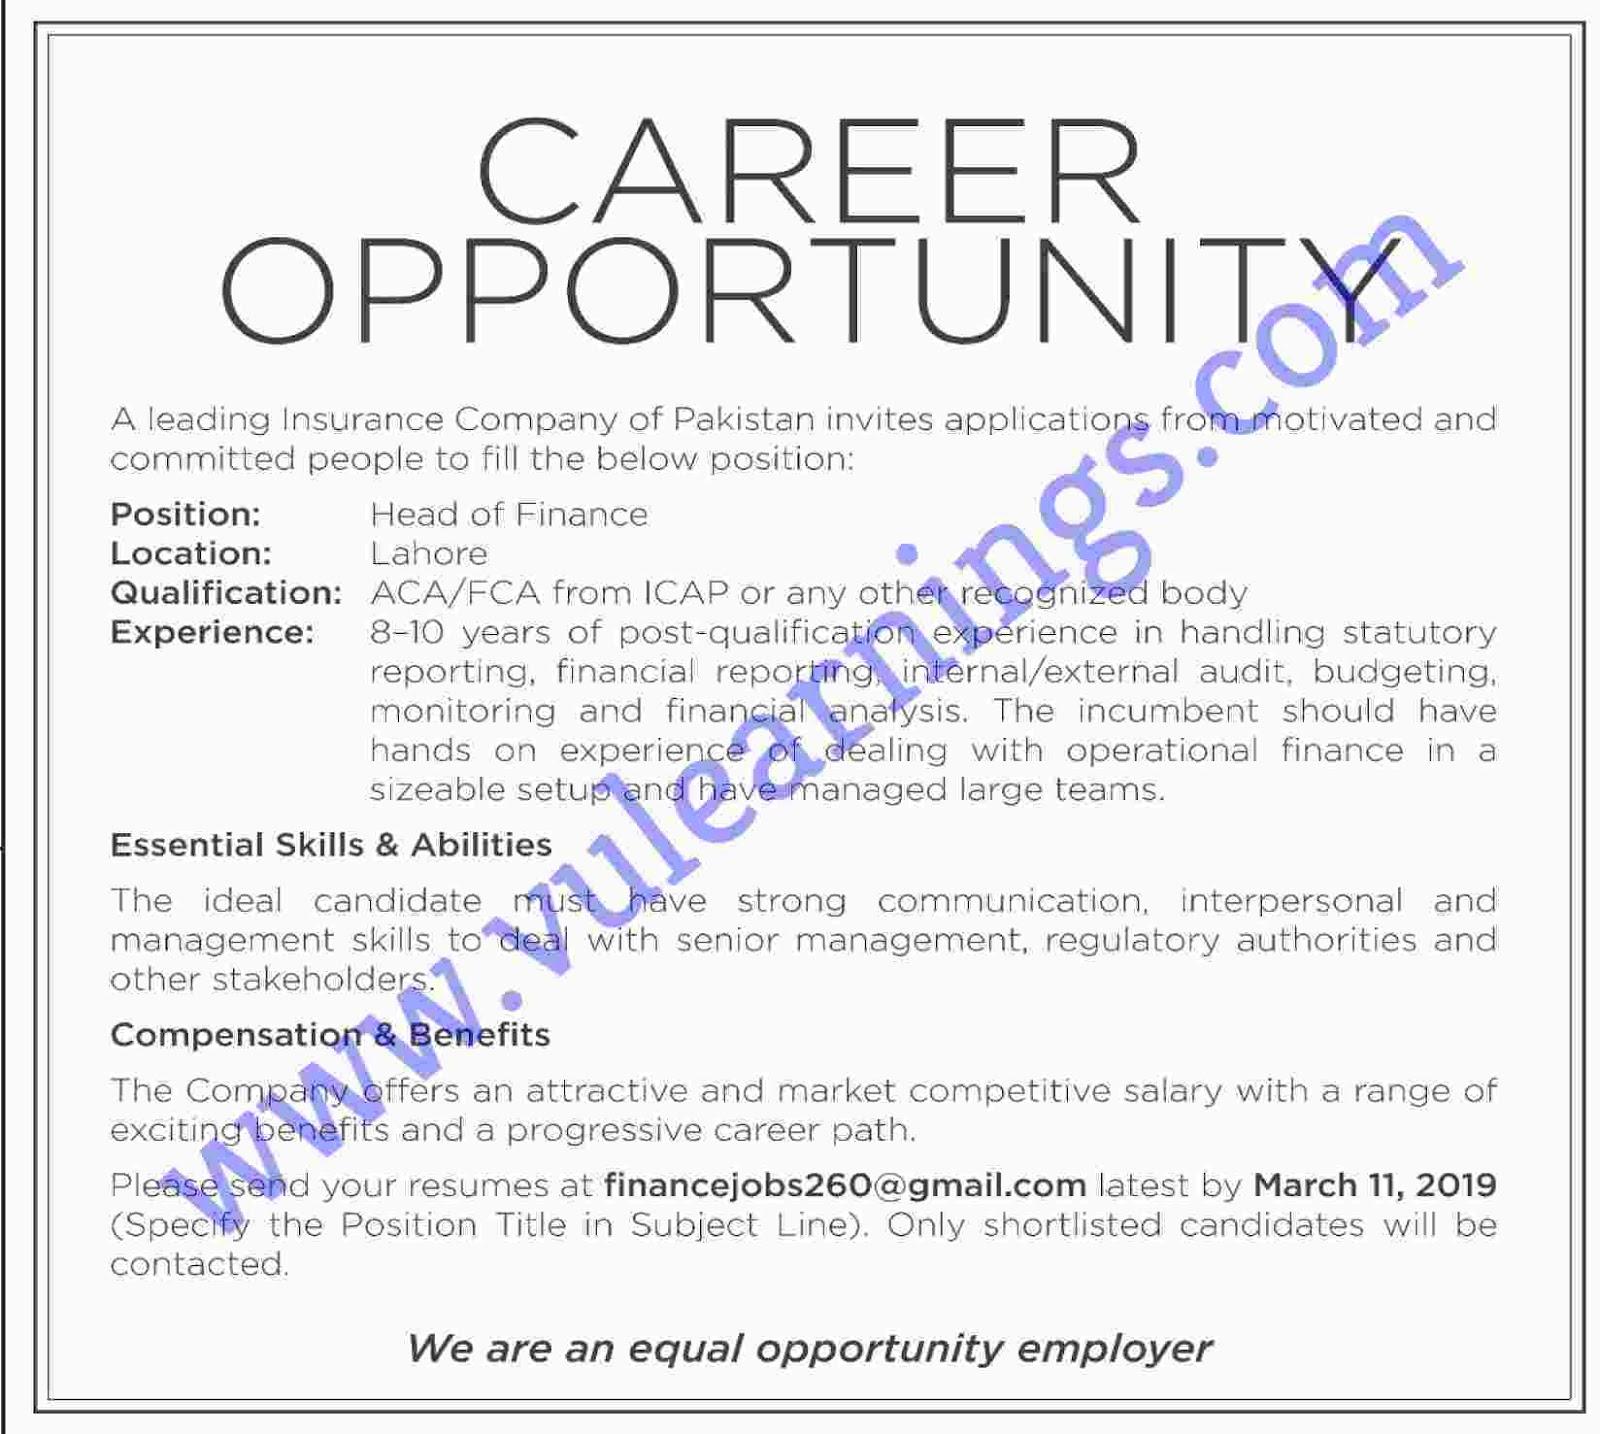 Job in A Leading Insurance Company